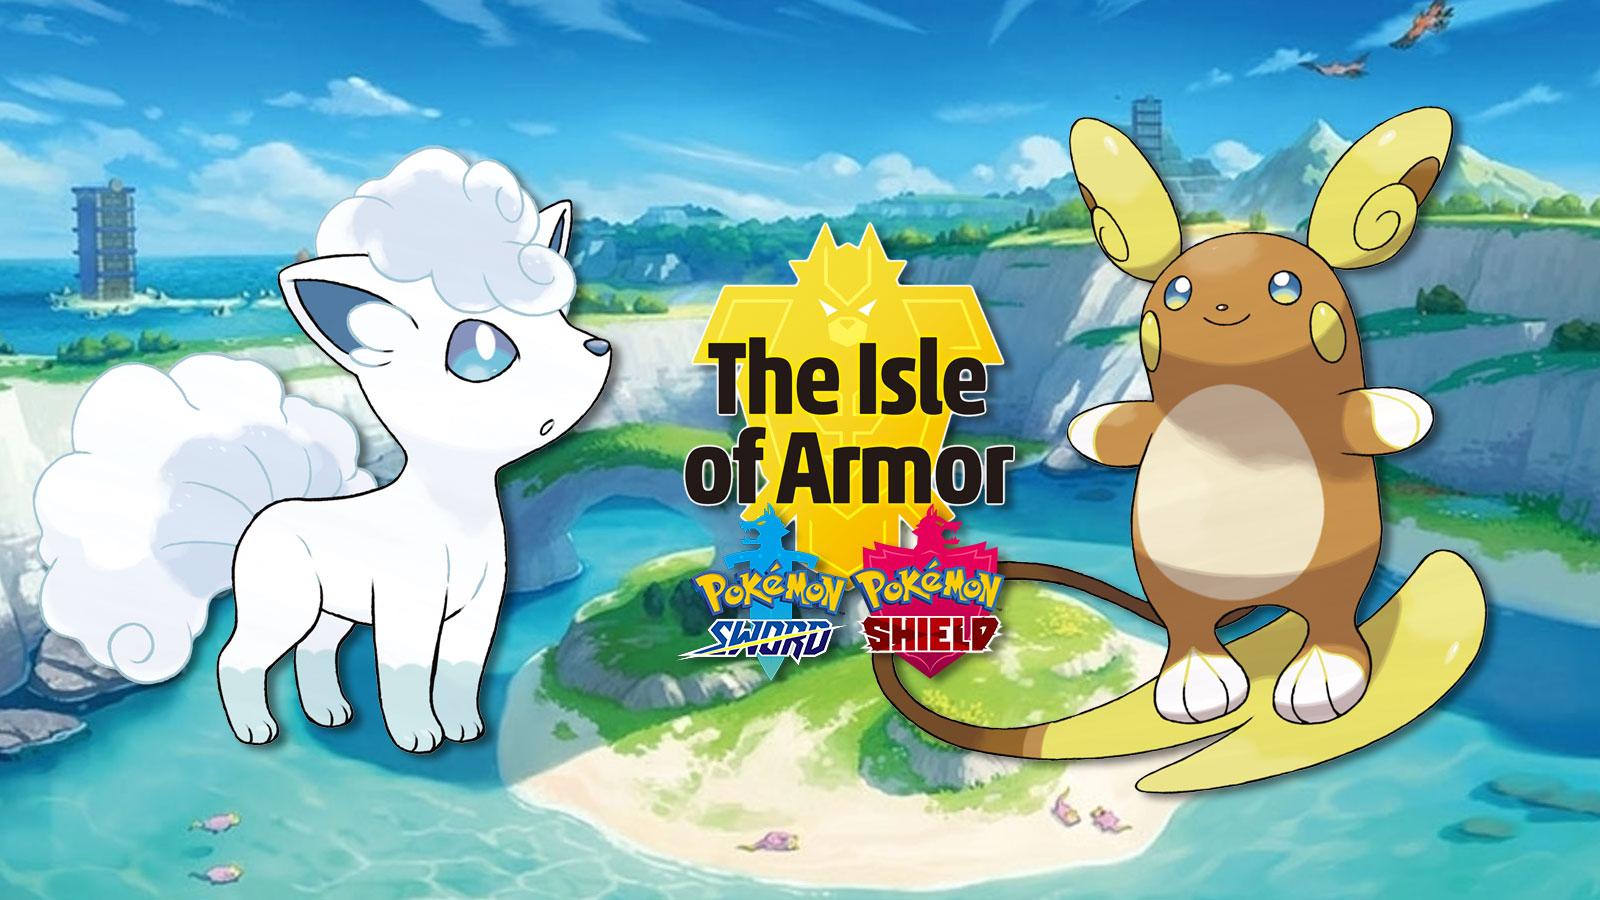 pokemon isle of armor alolan raichu vulpix